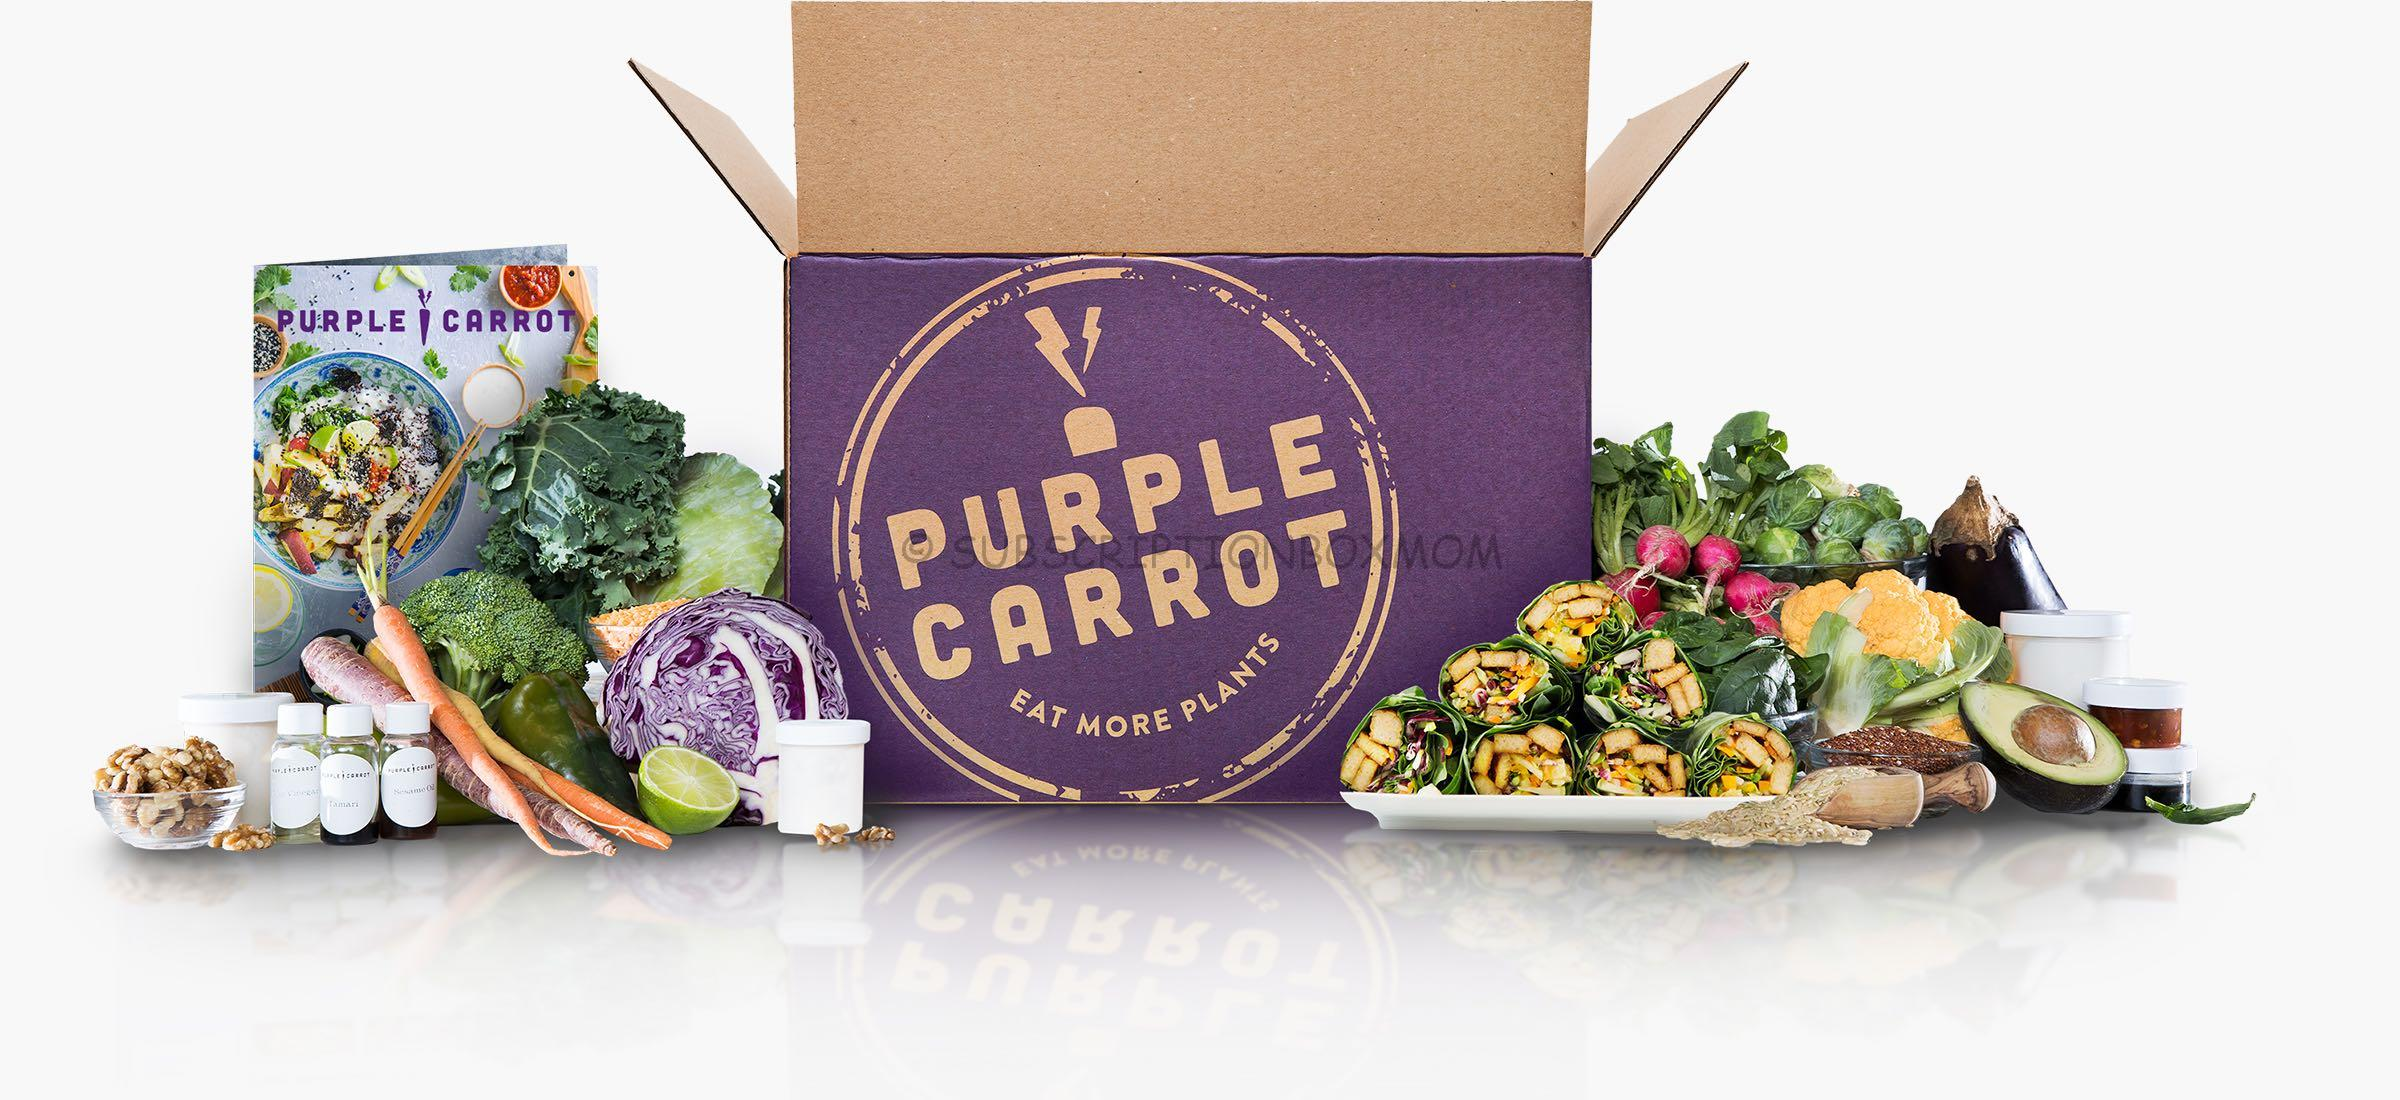 New Purple Carrot Thanksgiving Box 2019